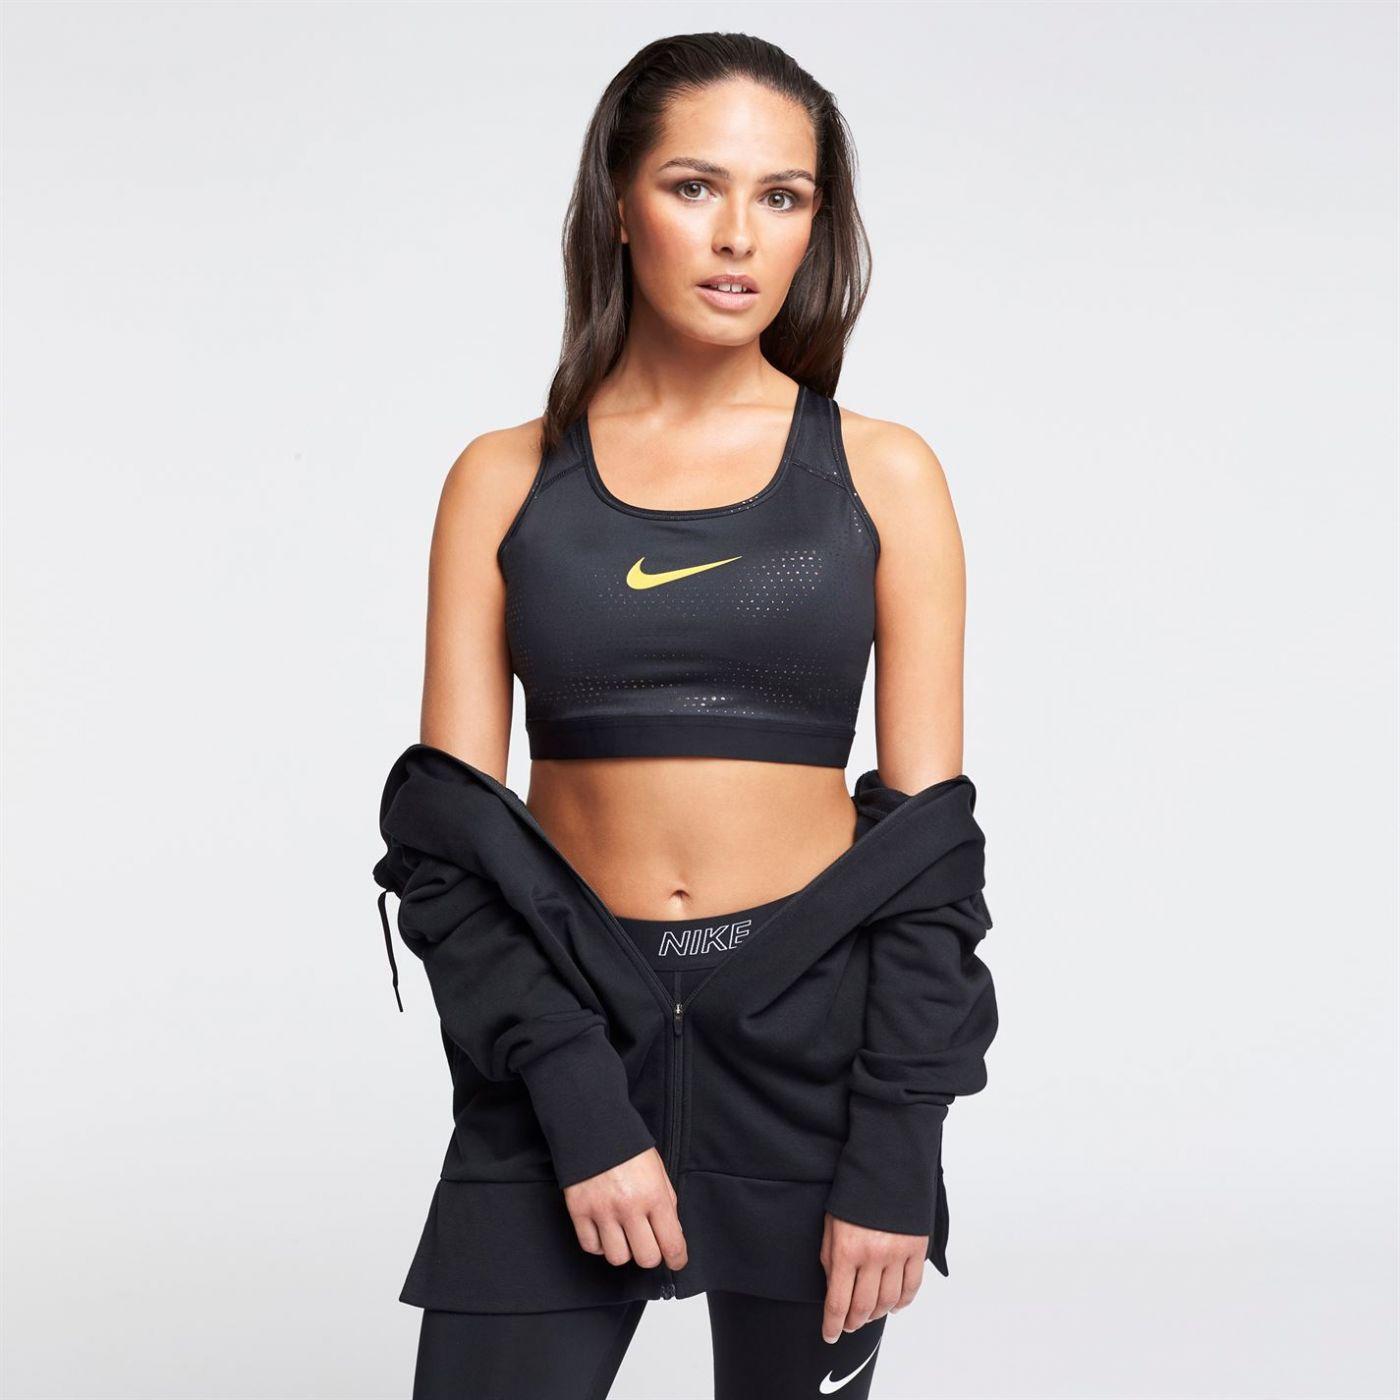 Nike Metallic Dot Print Sports Bra Ladies